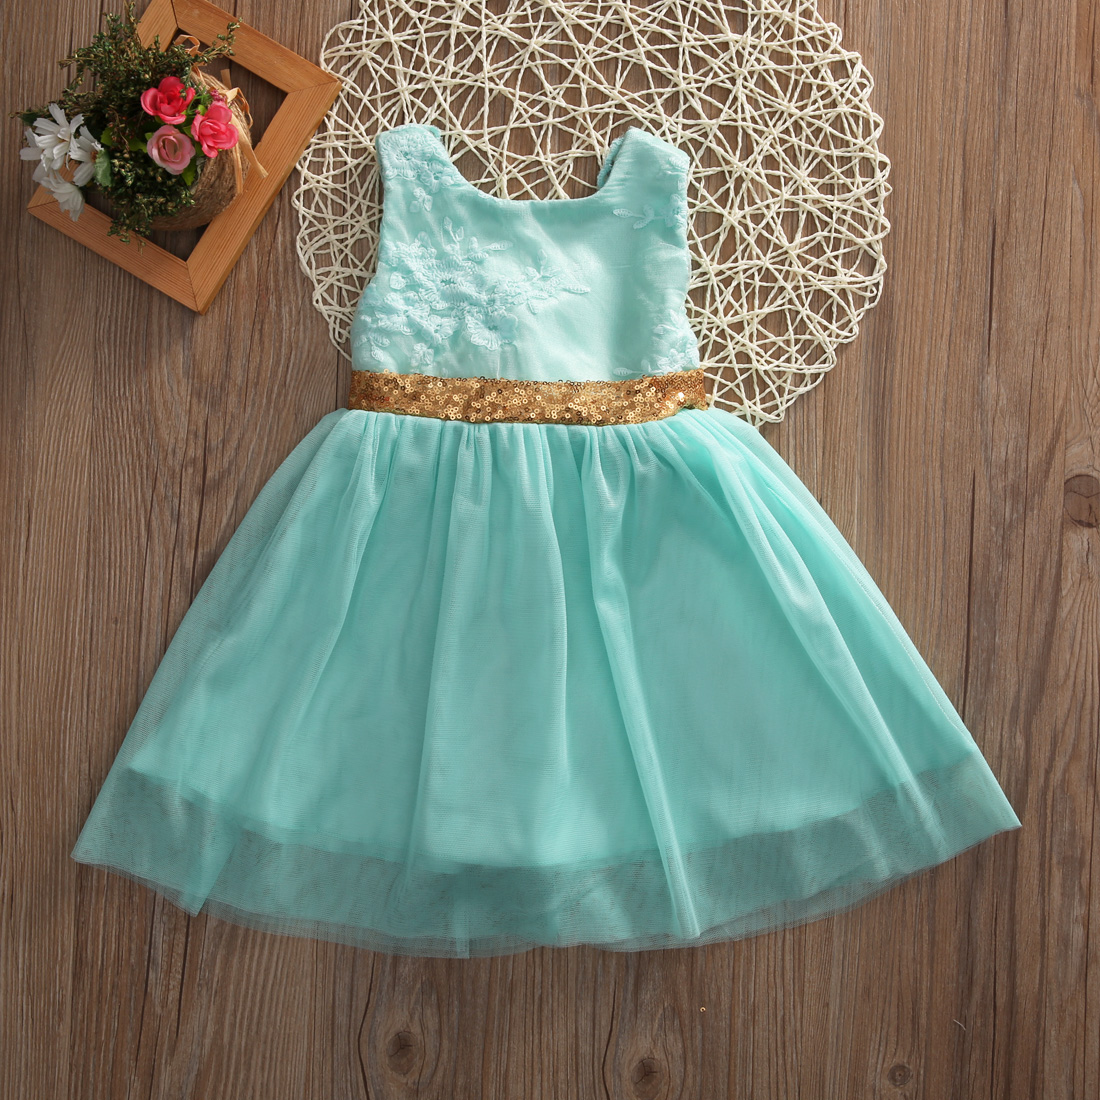 Flower Girl Kid Princess Dresses Cute summer Sleeveless embroidery Green Bowknot Wedding Party Formal Sequin Ball Gown Dress